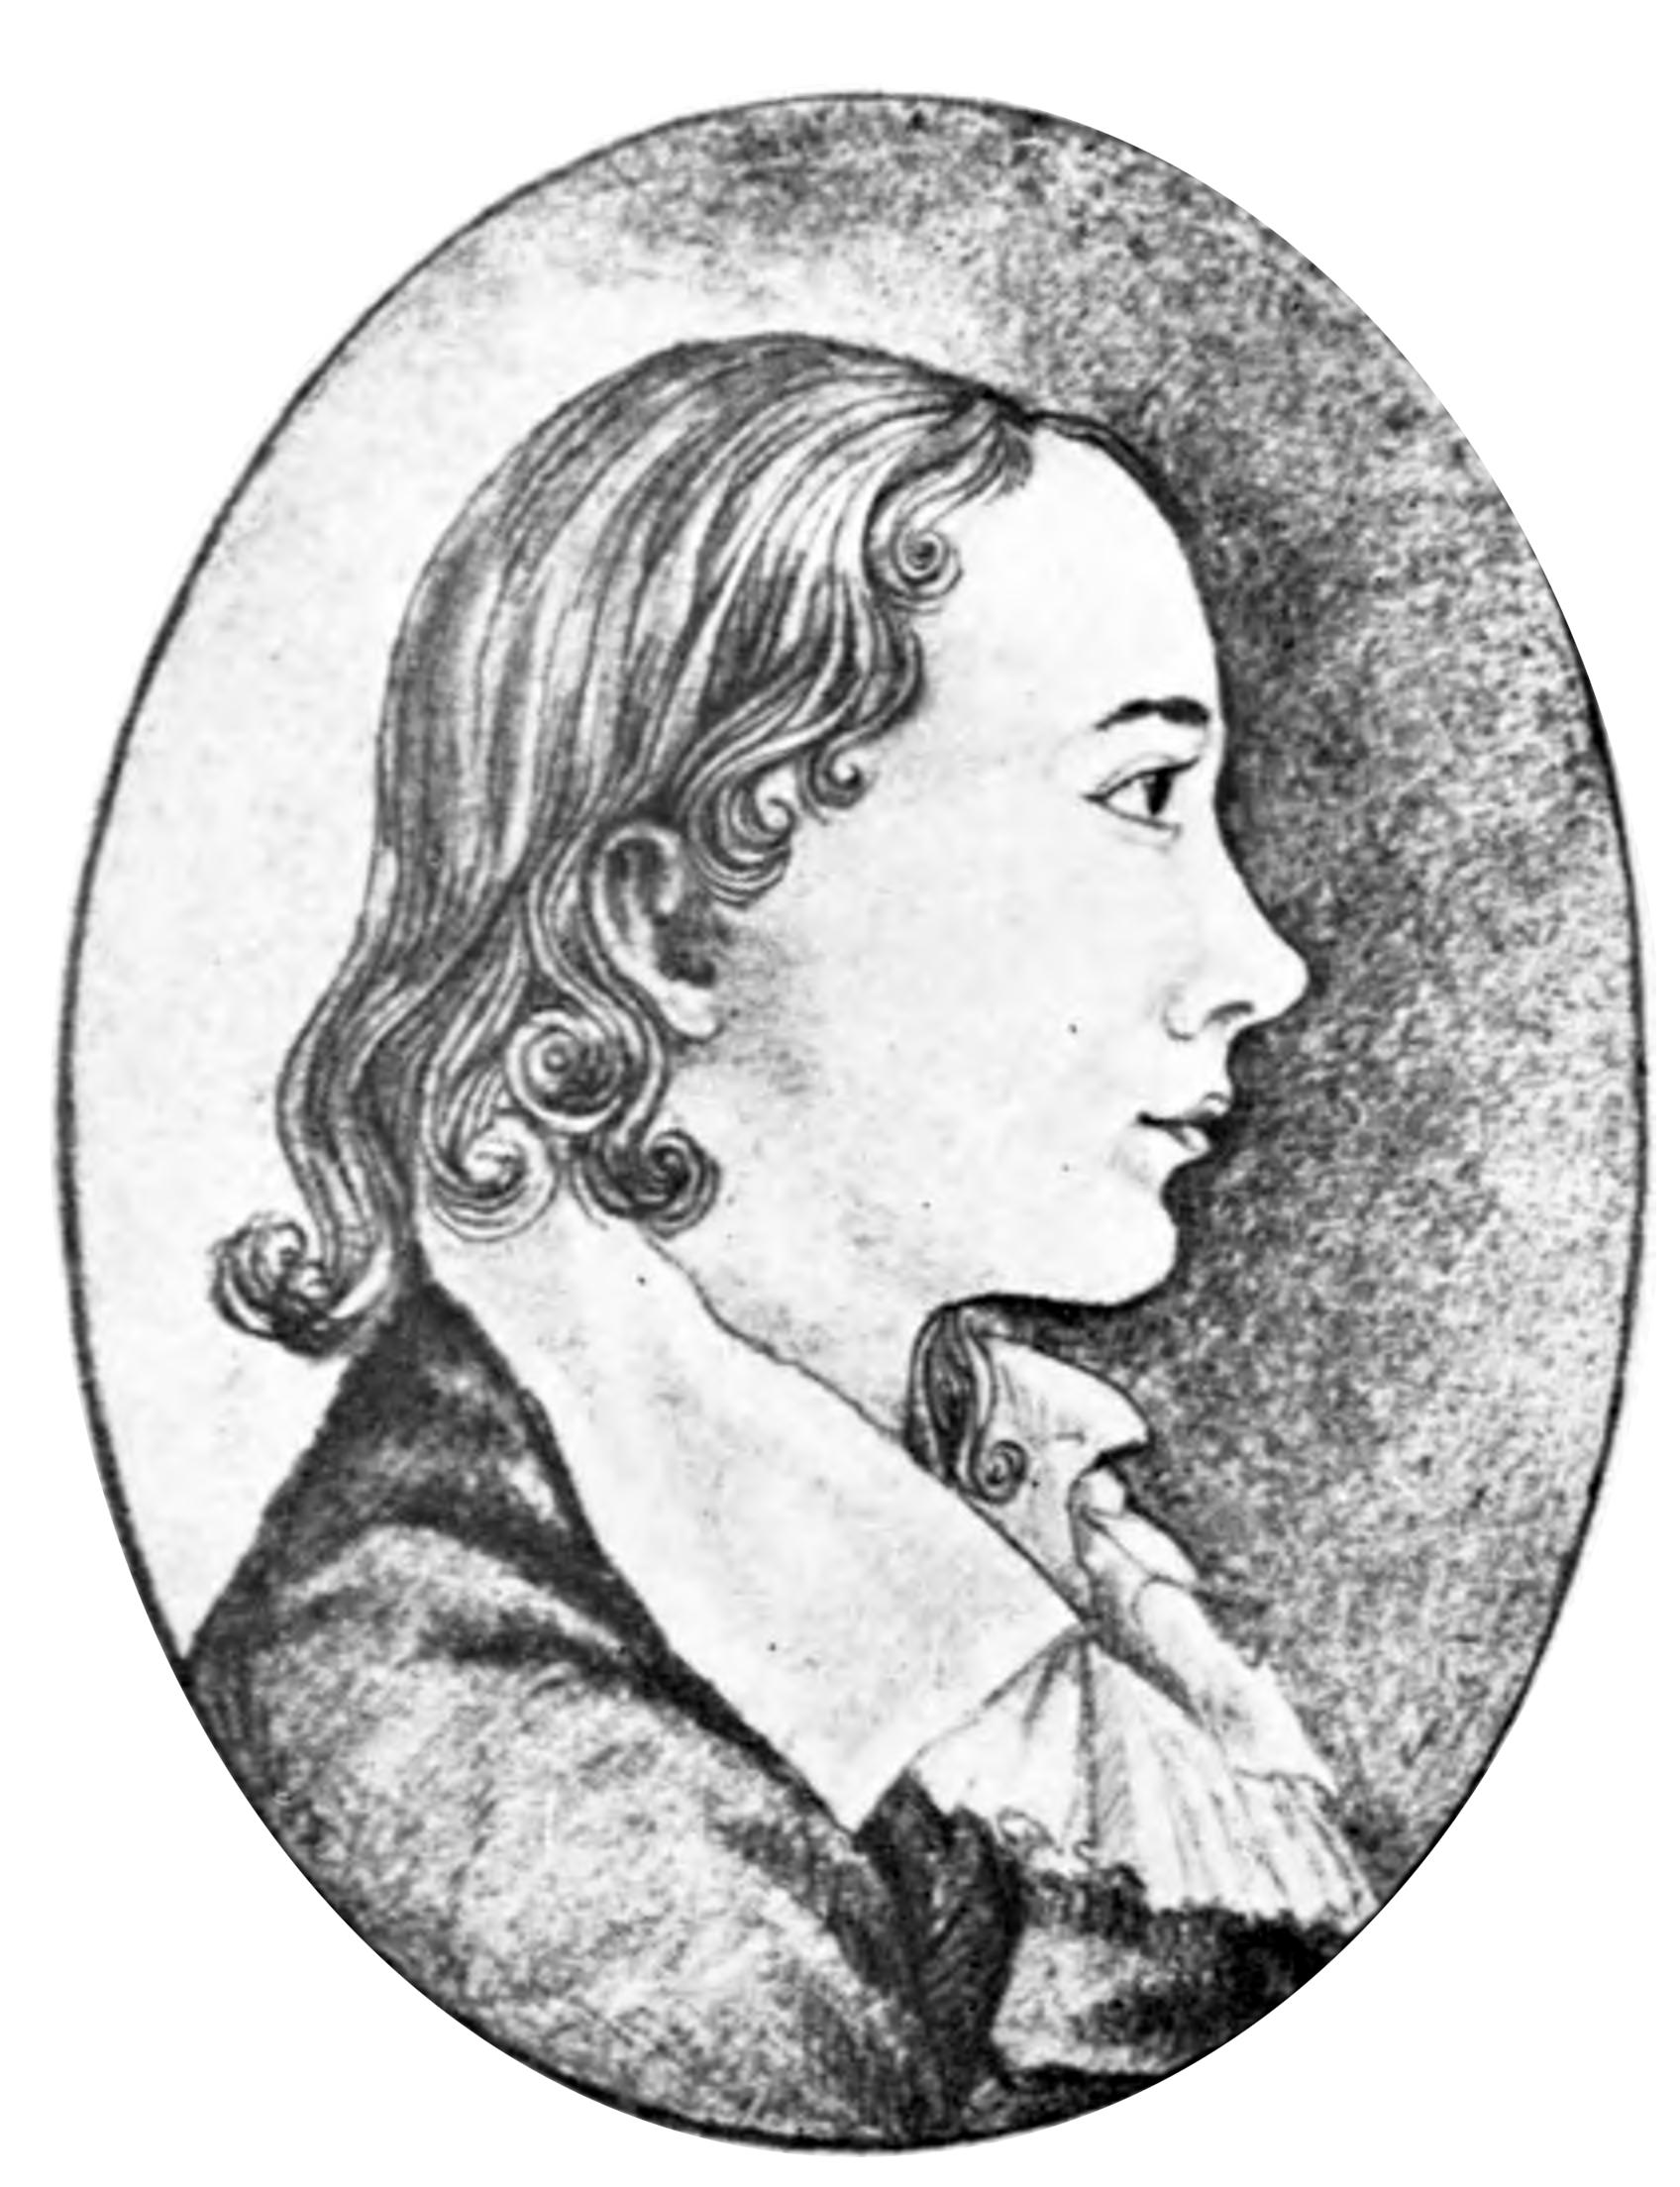 File:IG Nast - Friedrich Hölderlin (Pencil 1788).png - Wikimedia Commons